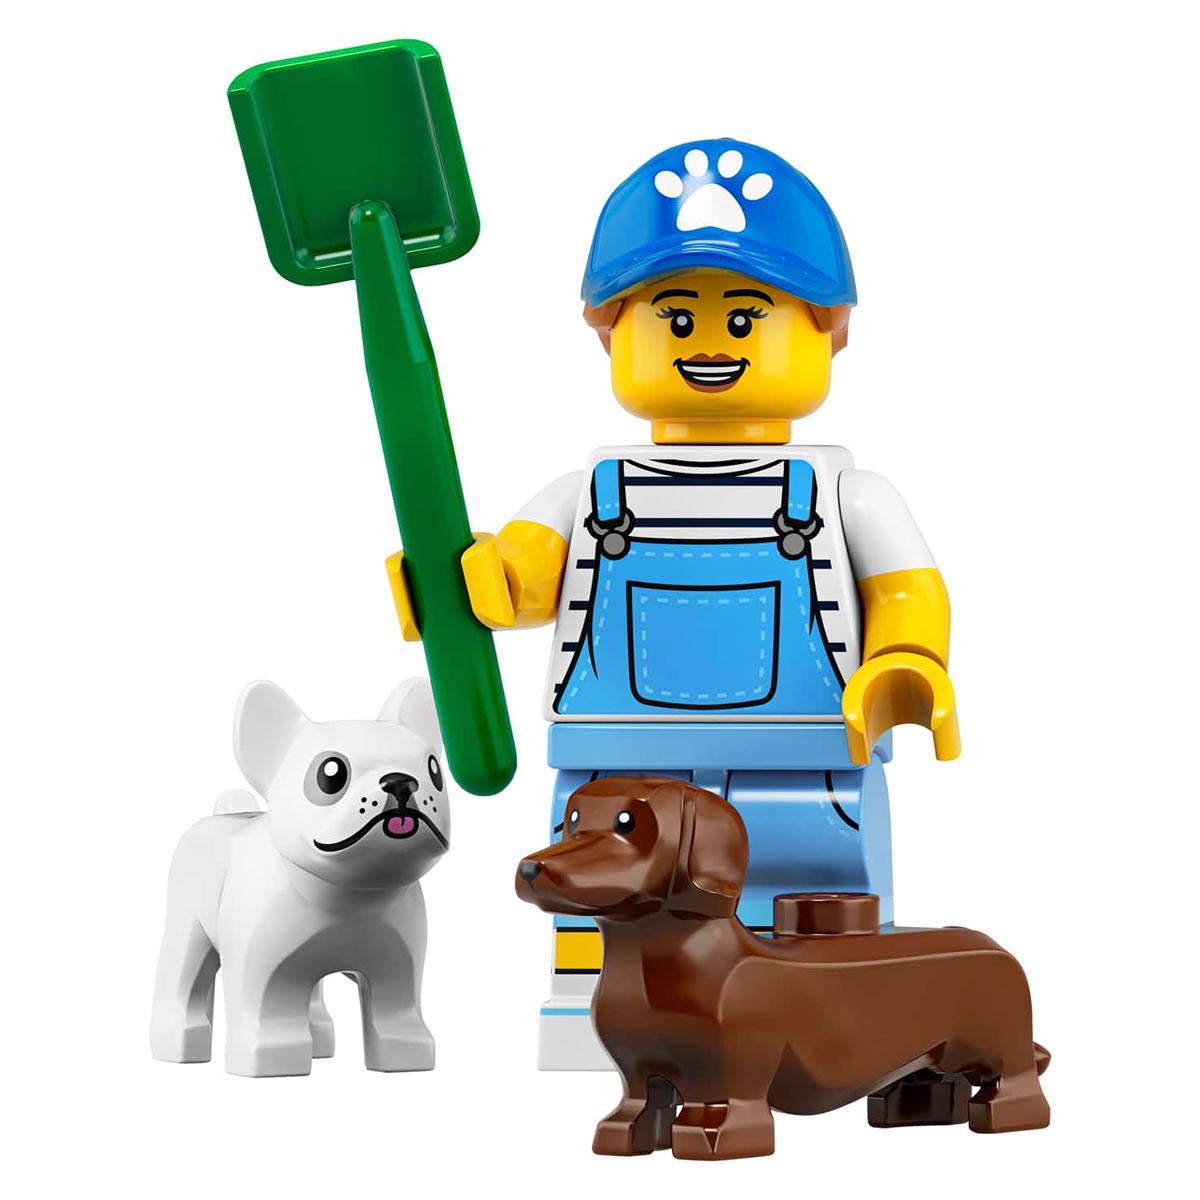 lego-minifiguren-sammelserie-collectible-minifigures-serie-19-71025-2019-1 zusammengebaut.com